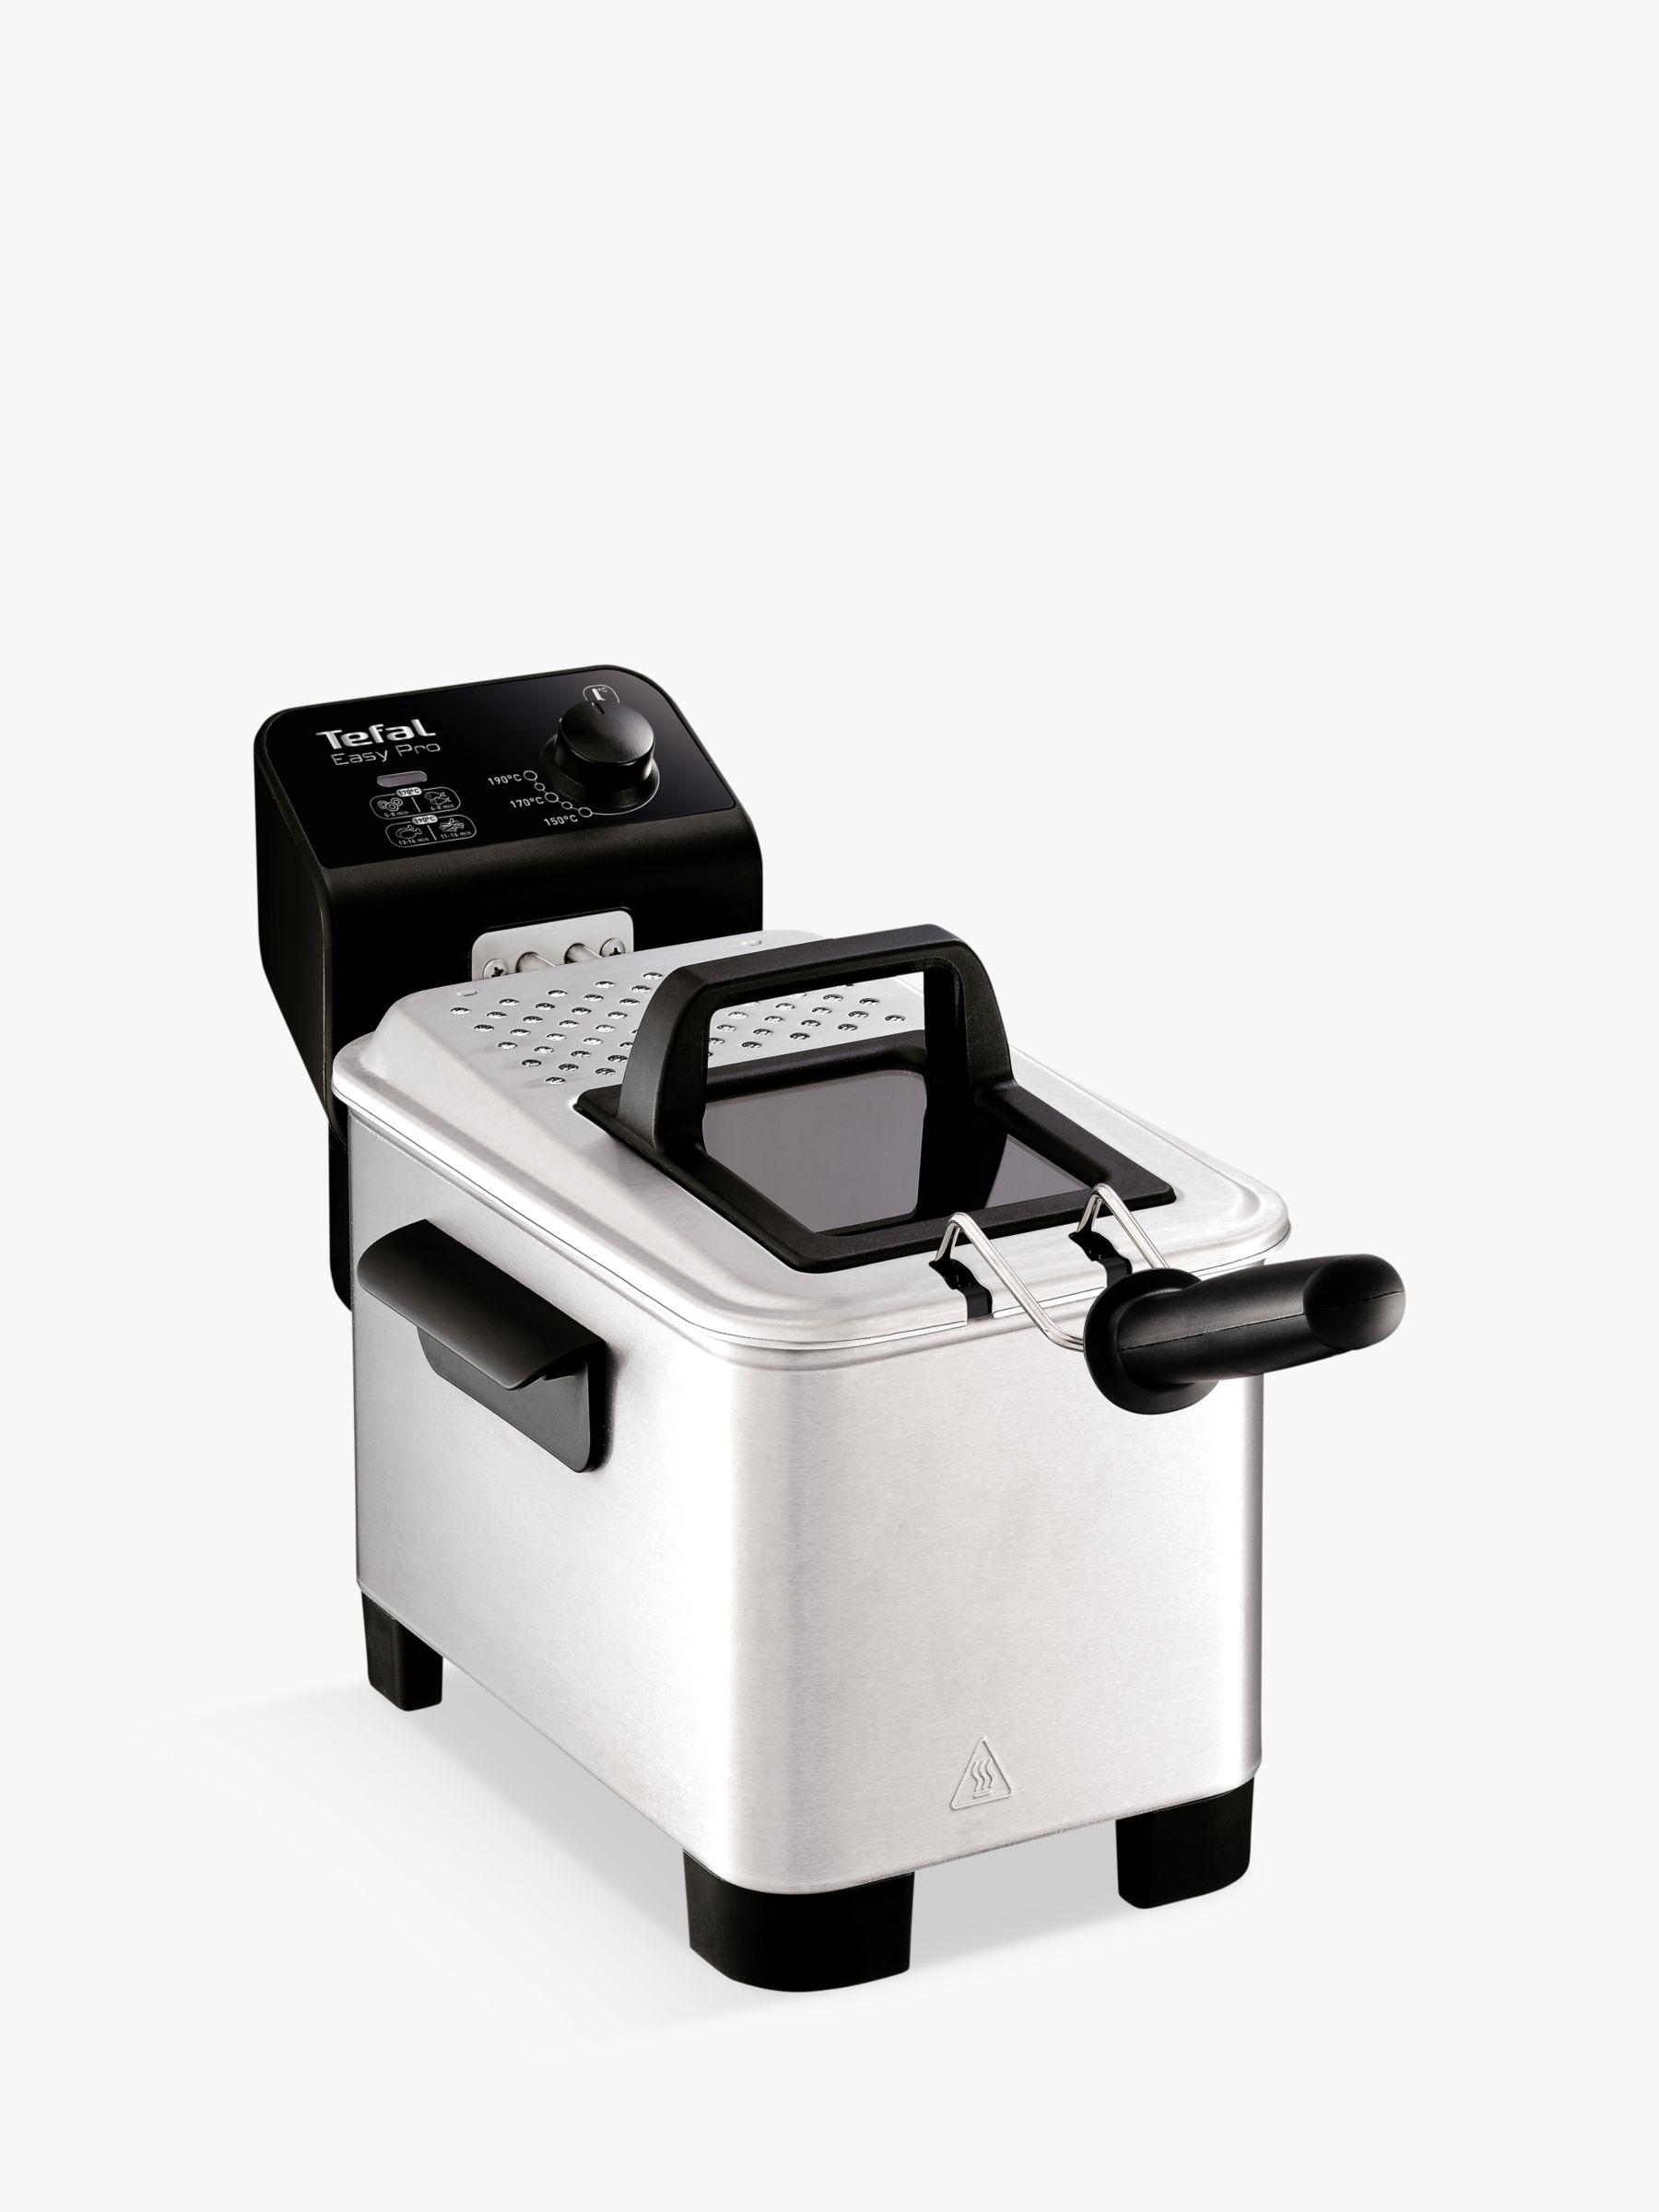 Tefal Tefal Easy Pro Deep Fryer, Stainless Steel